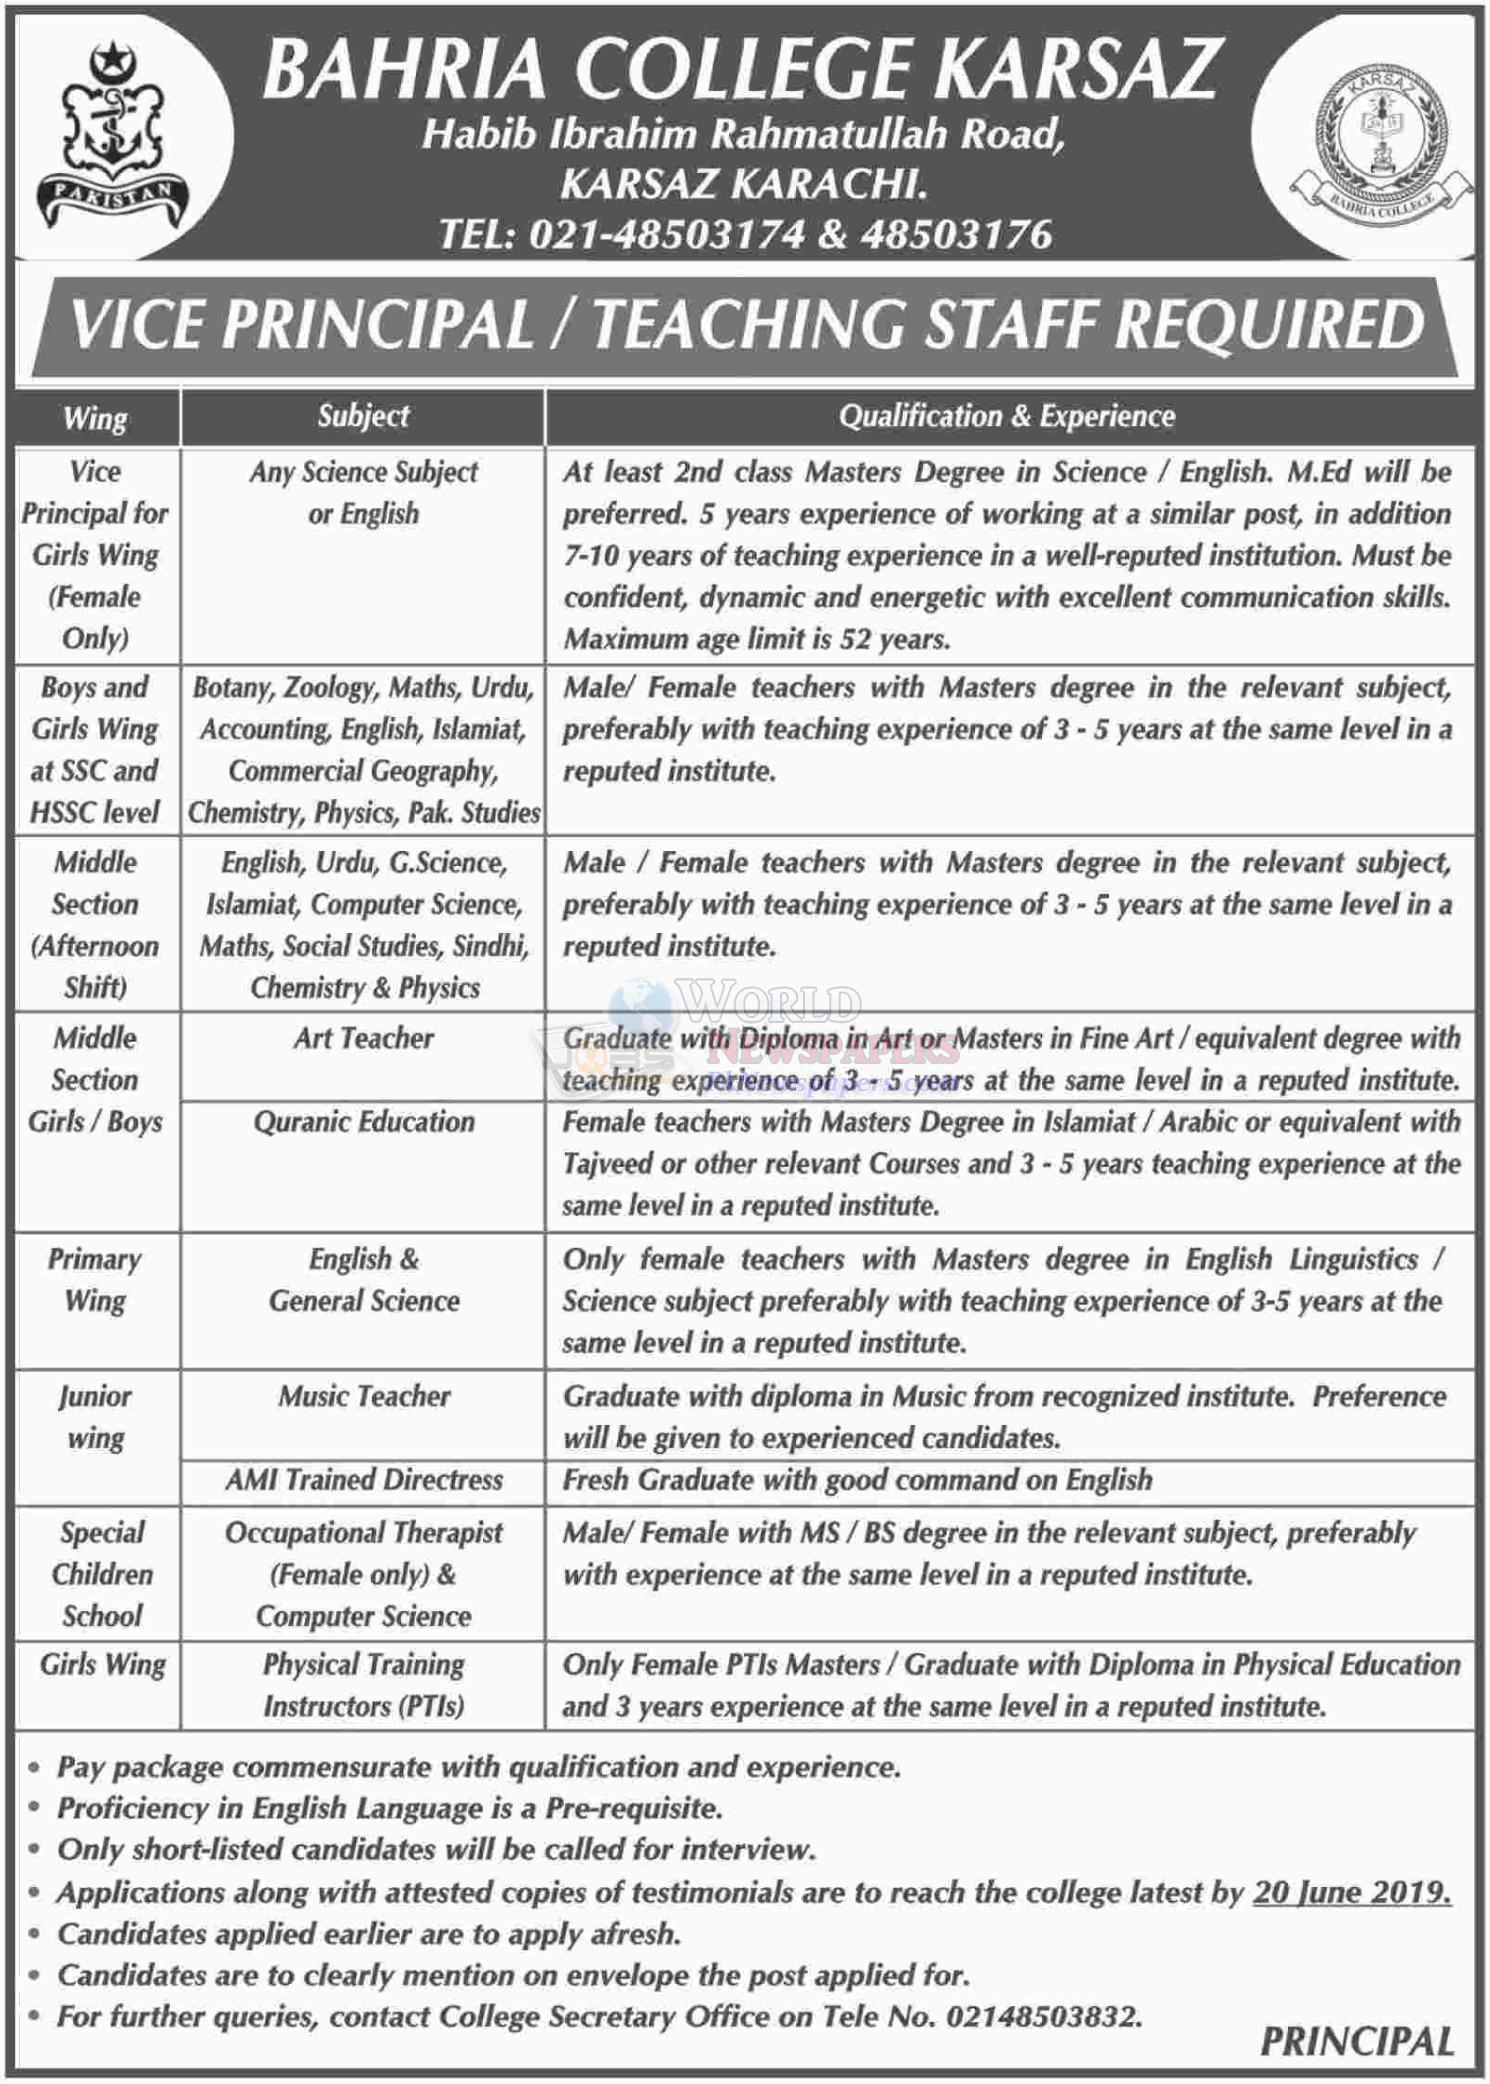 Bahria College Karsaz Karachi Jobs